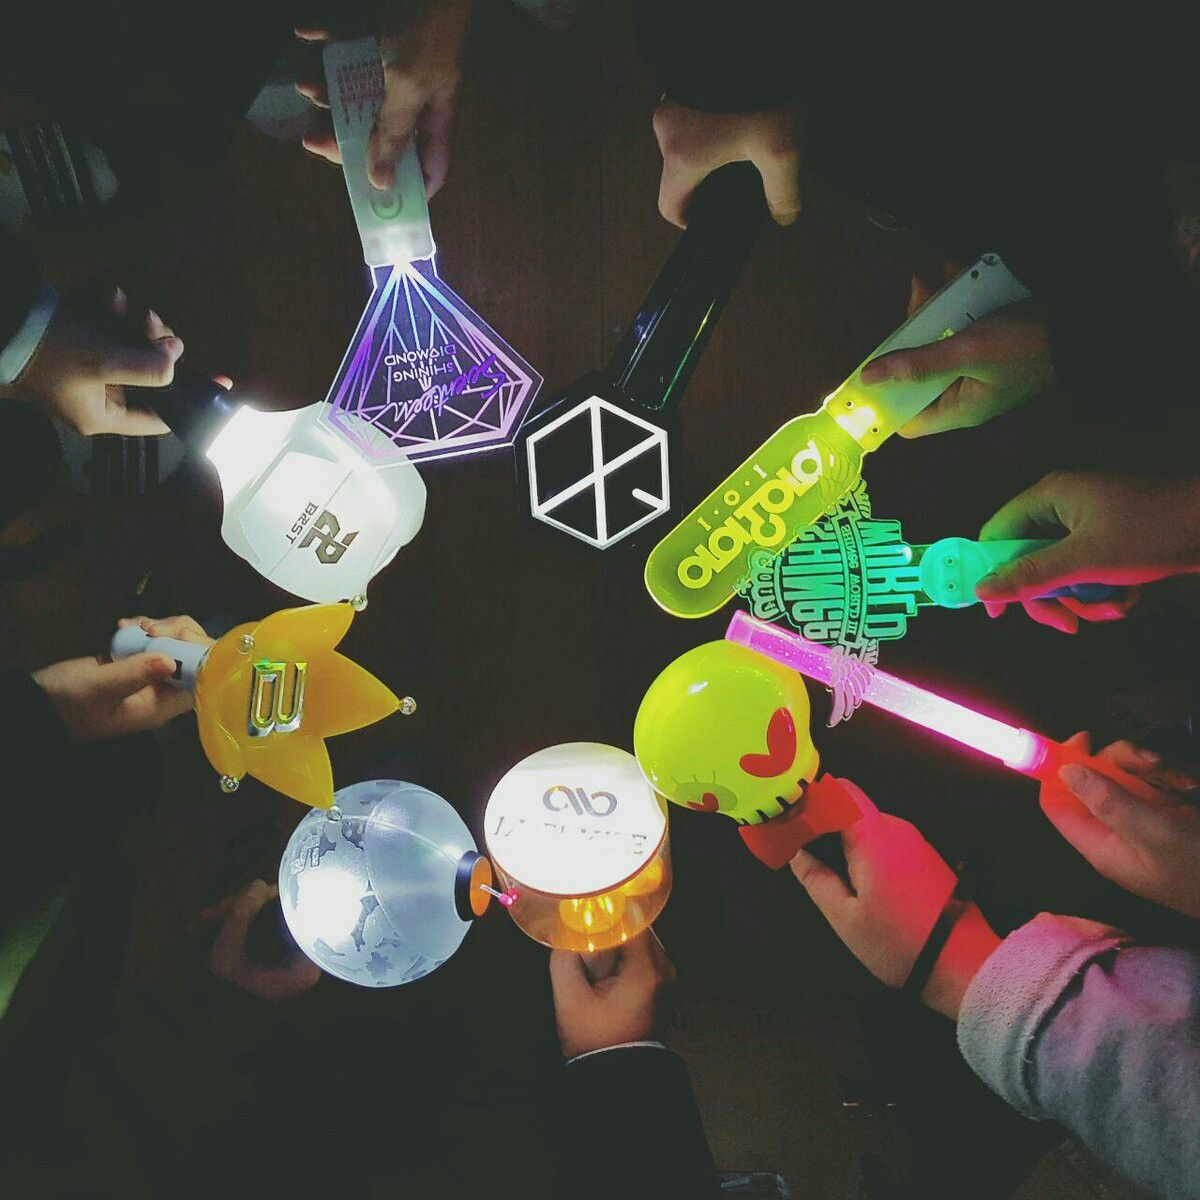 Lightstick Kpop This Is How The Fandom Needs To Be